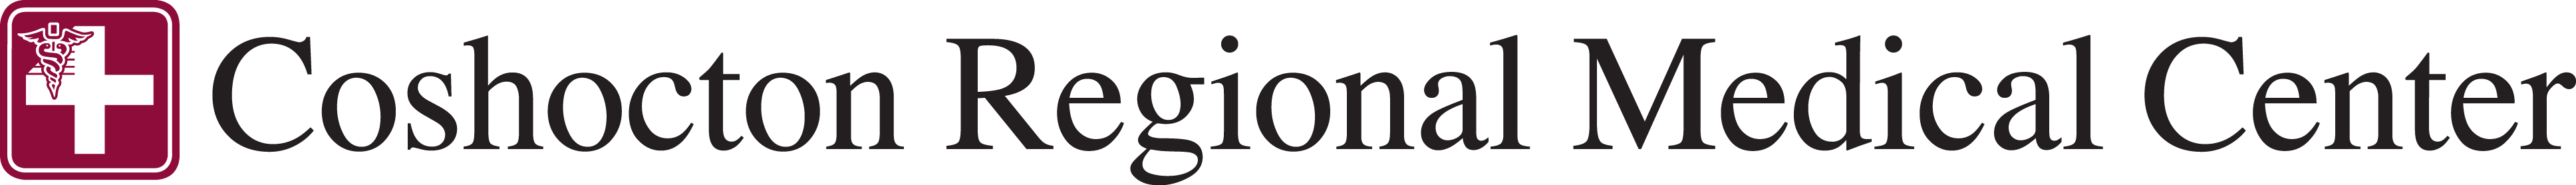 Coshocton Regional Medical Center Urgent Care Logo